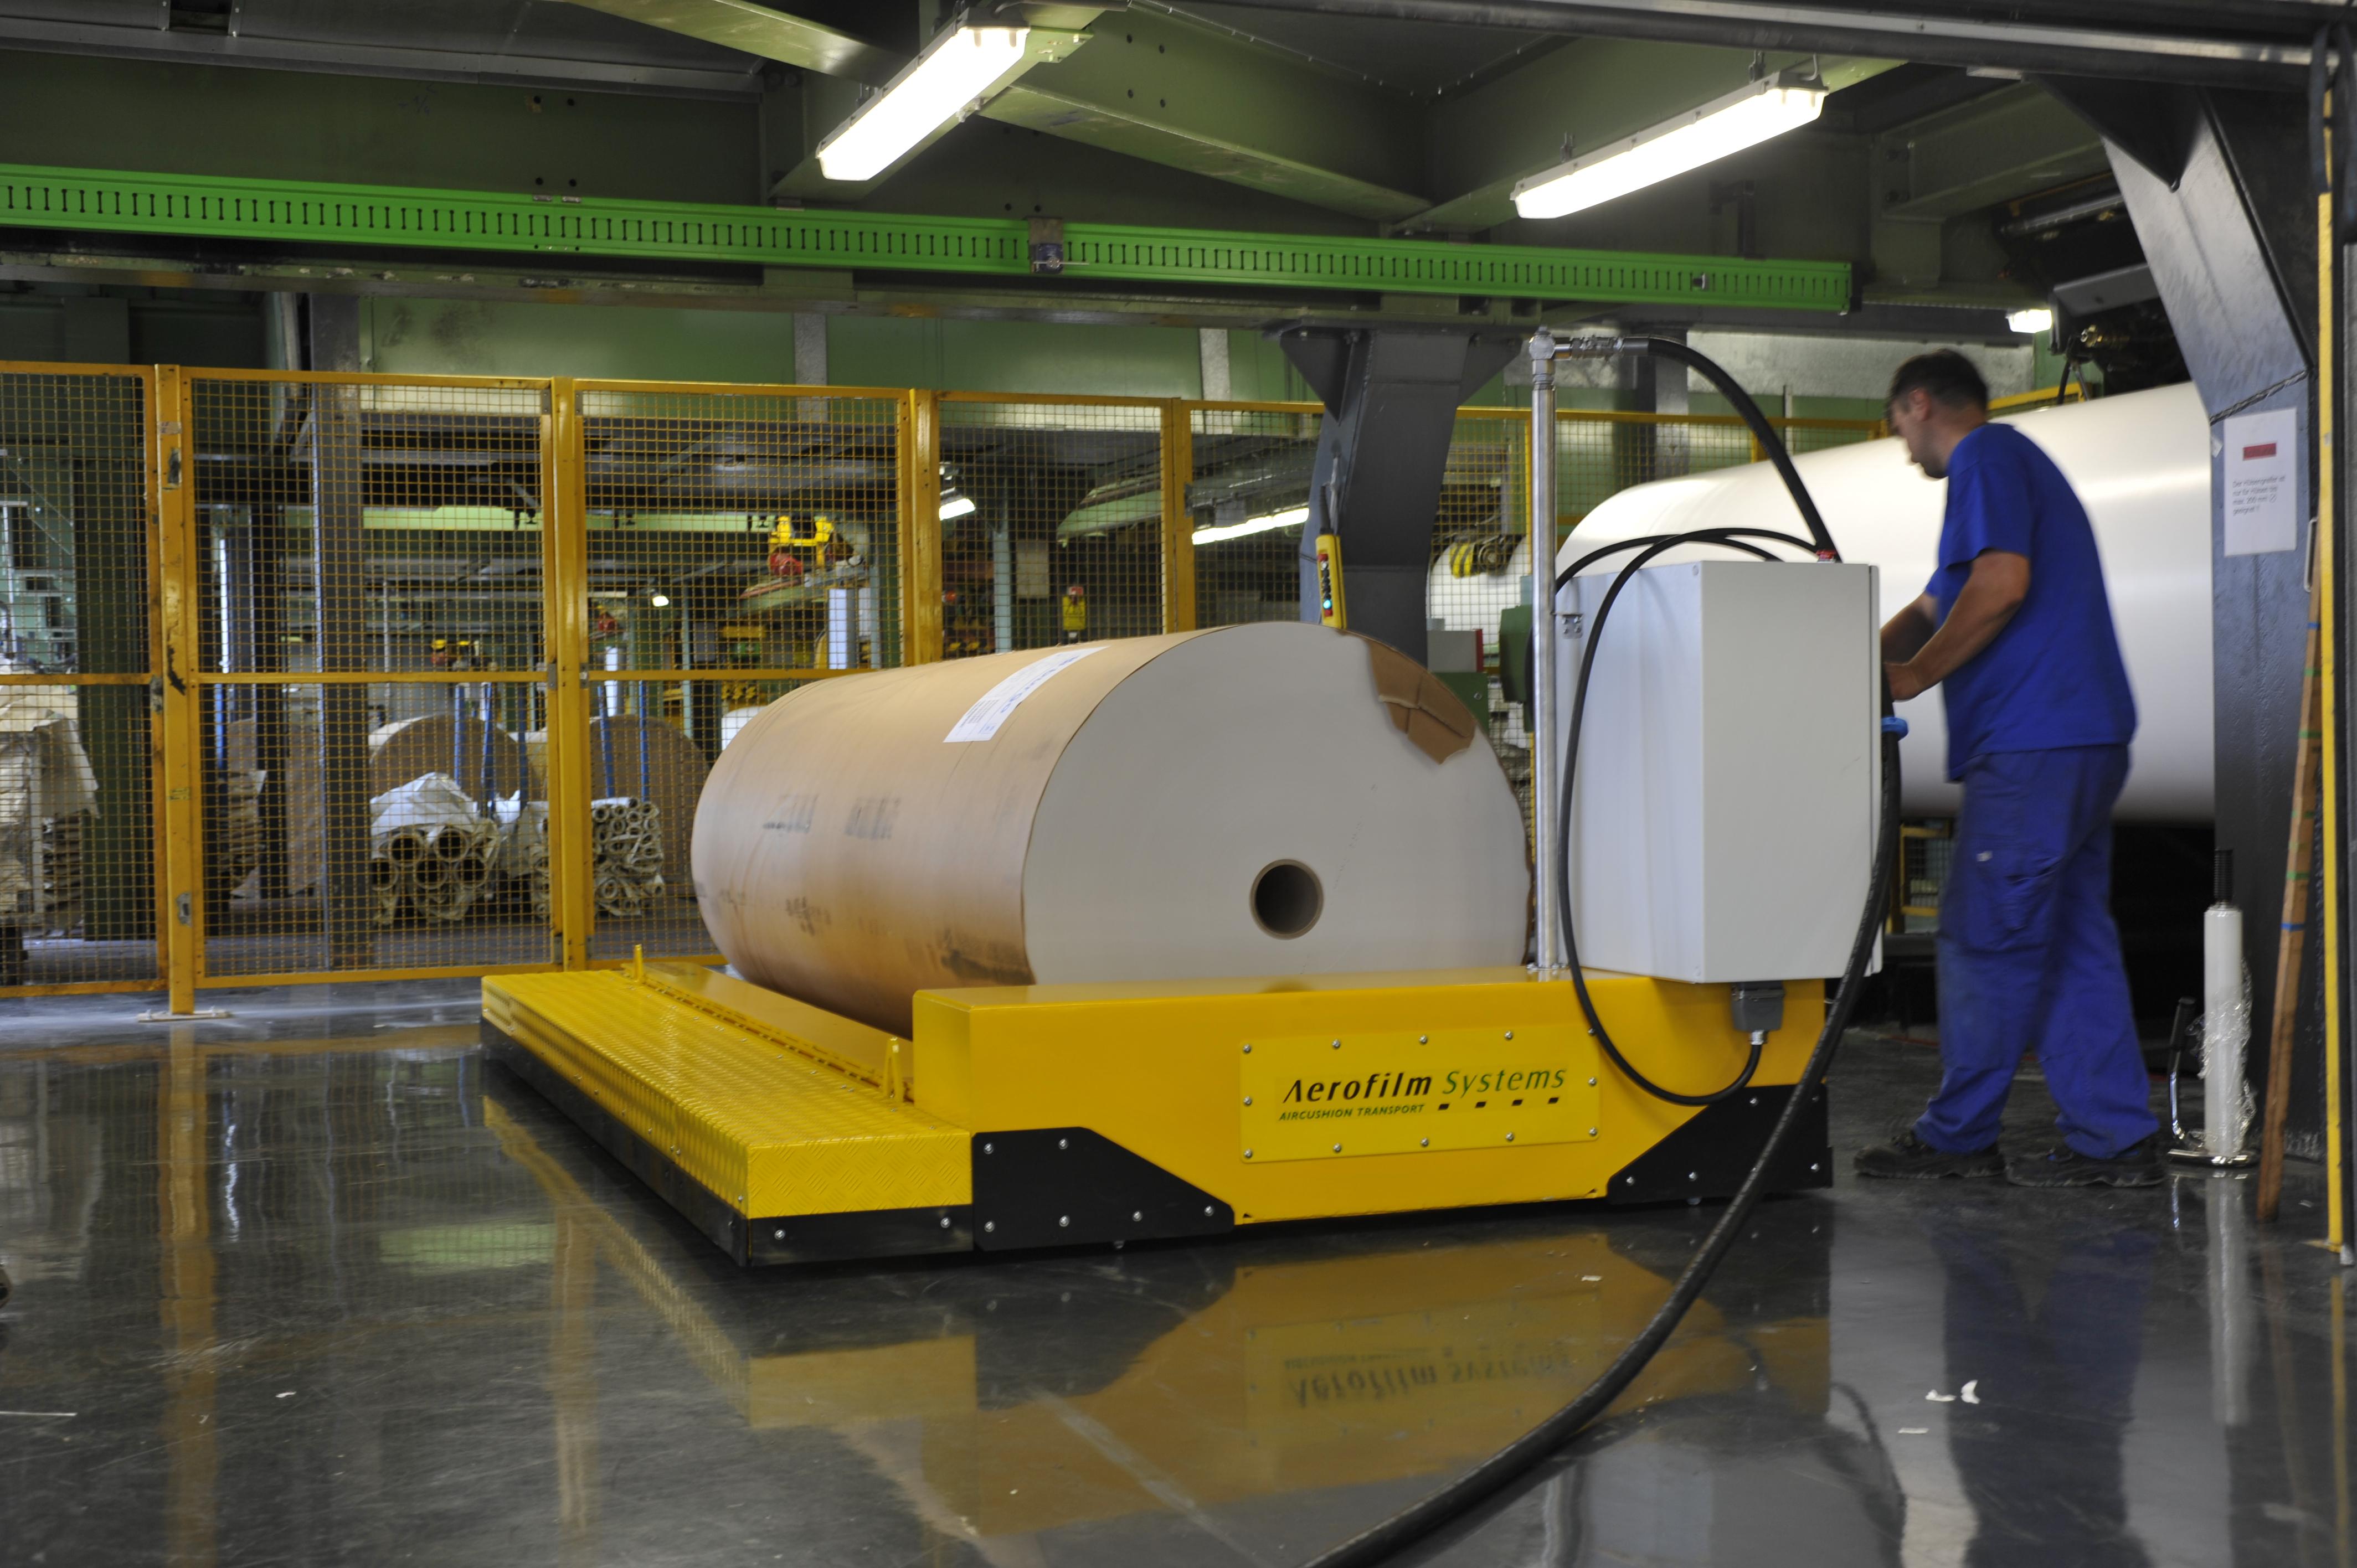 Heavy Transport Rolls Aerofilm Systems